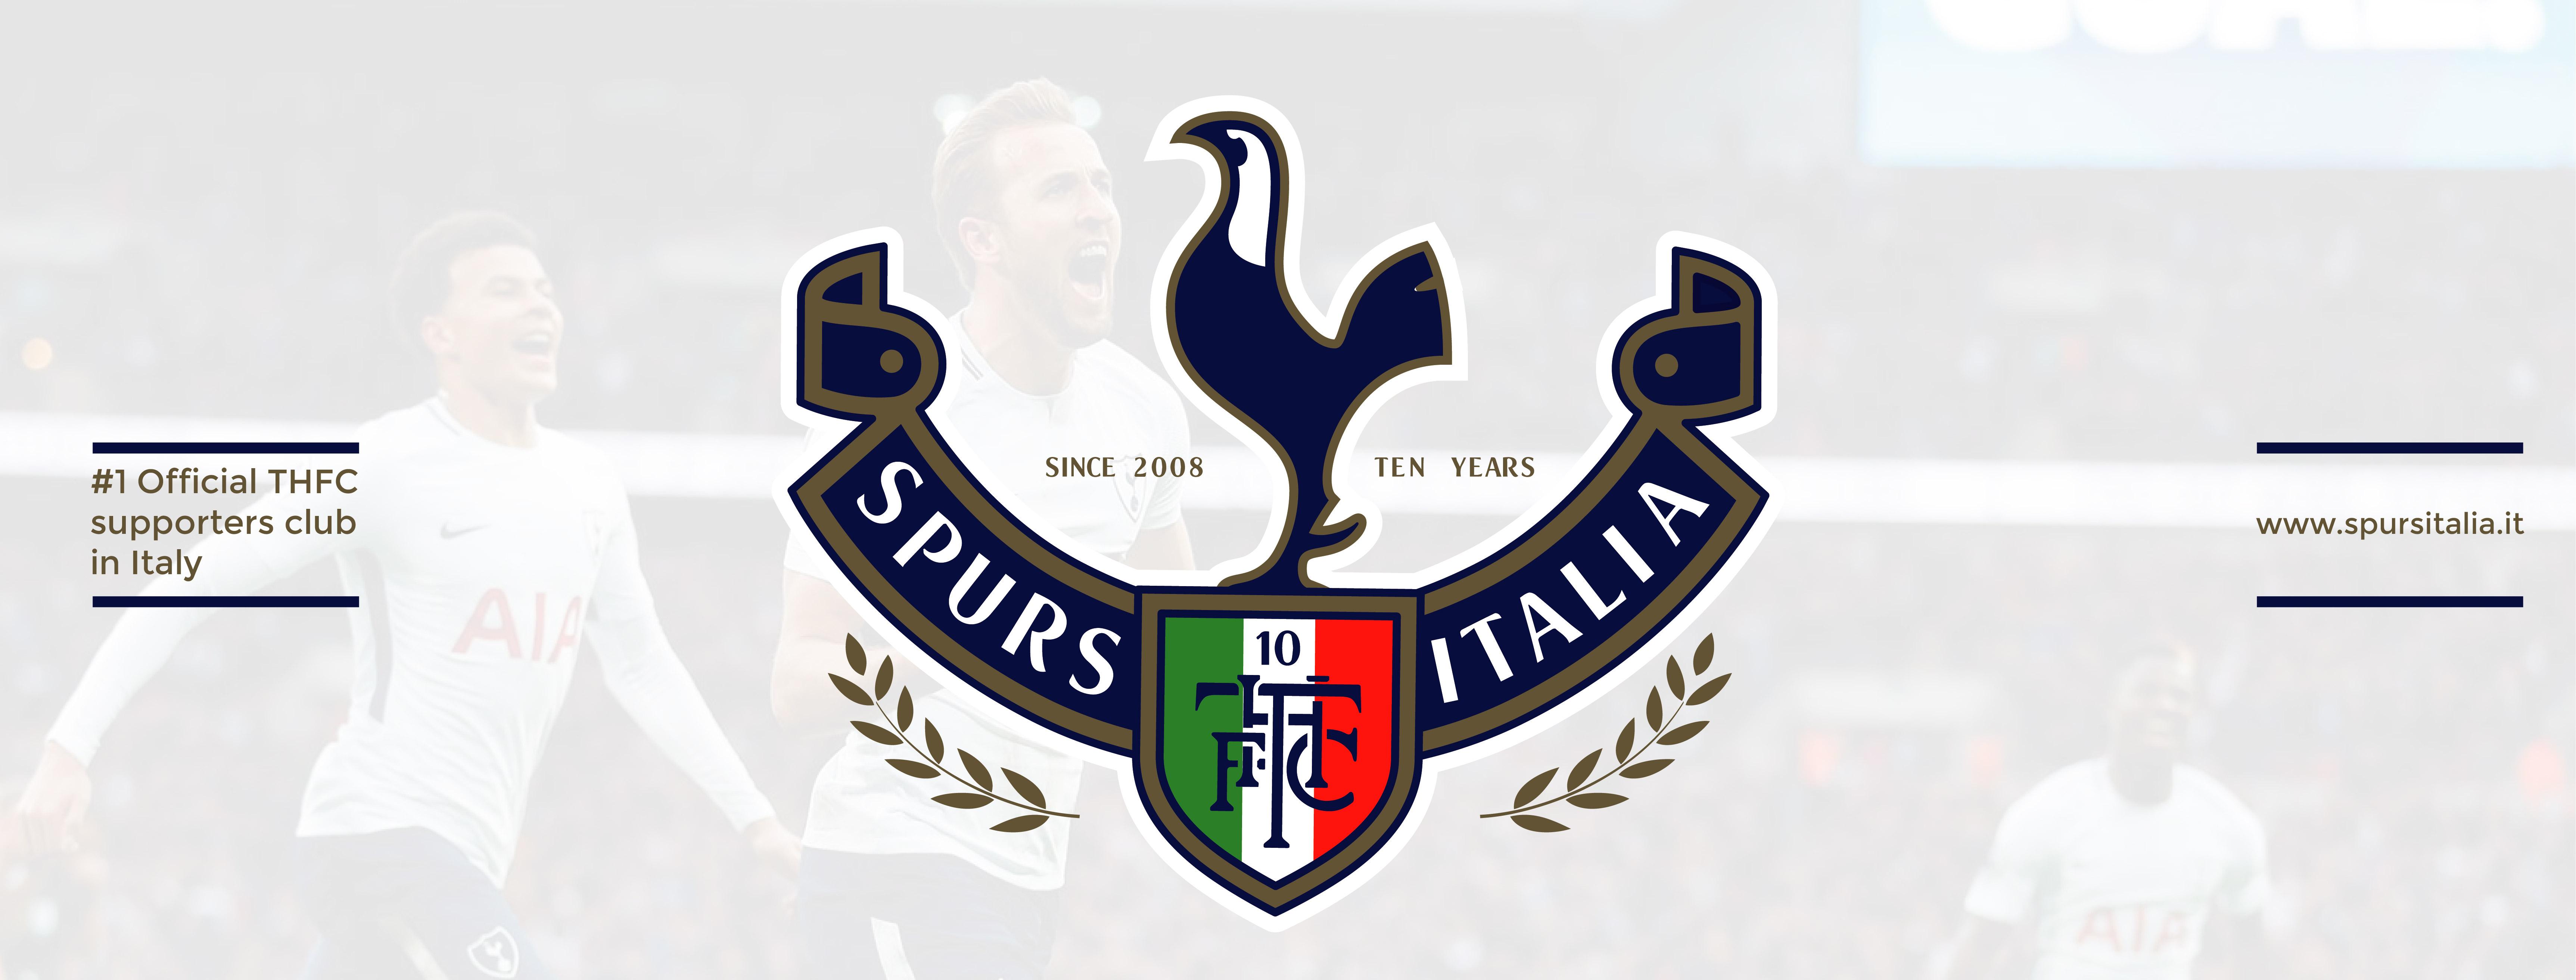 SPURS ITALIA